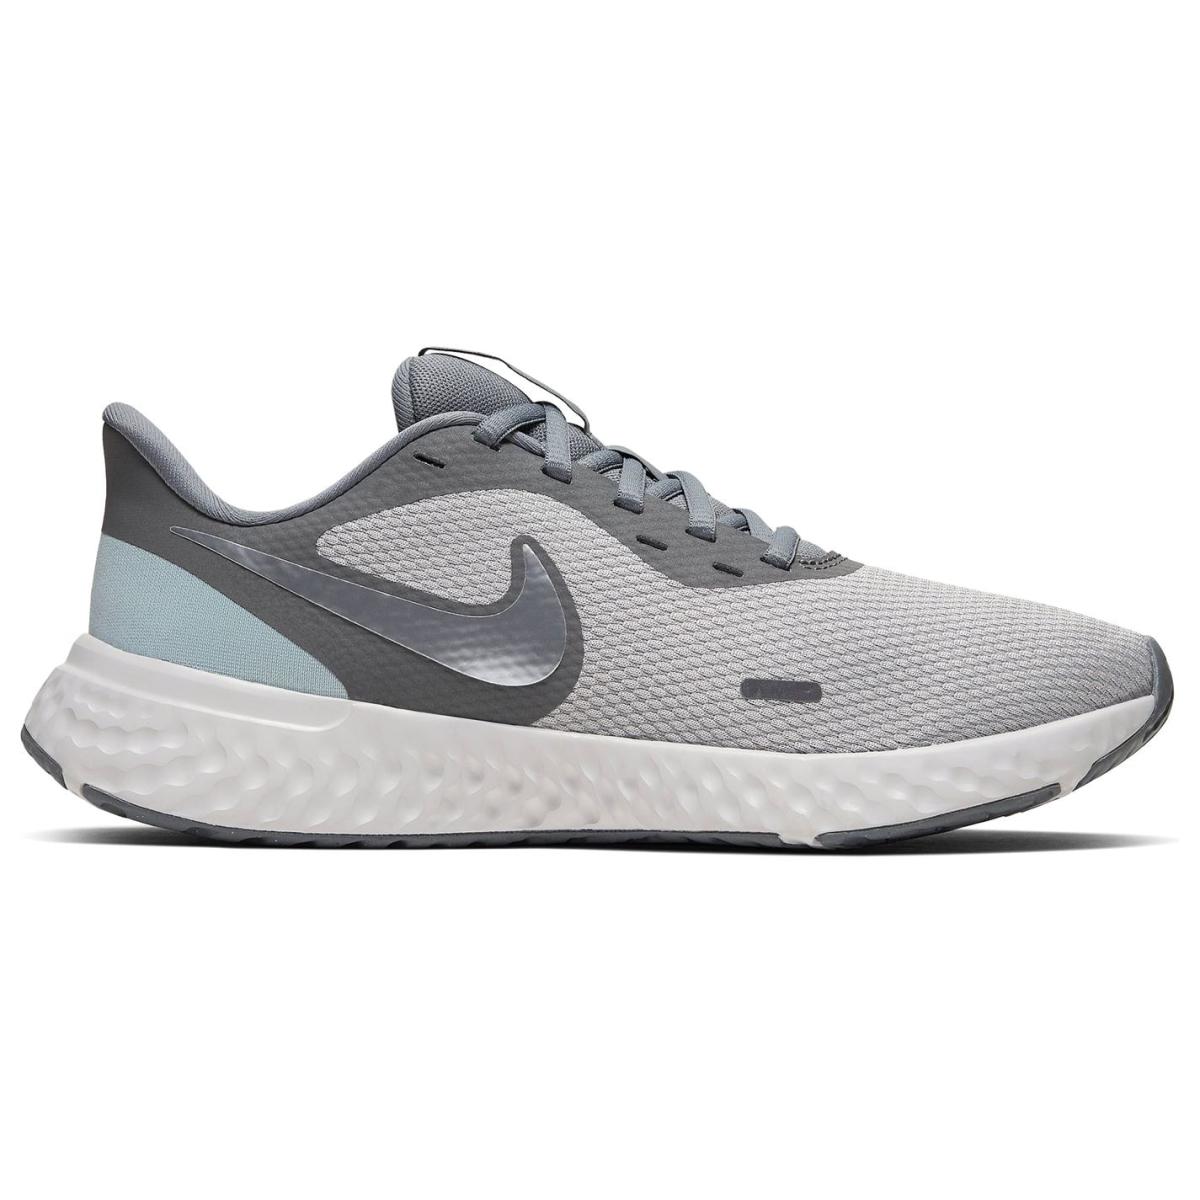 Nike-Revolution-Turnschuhe-Damen-Sneaker-Sportschuhe-Laufschuhe-1160 Indexbild 19